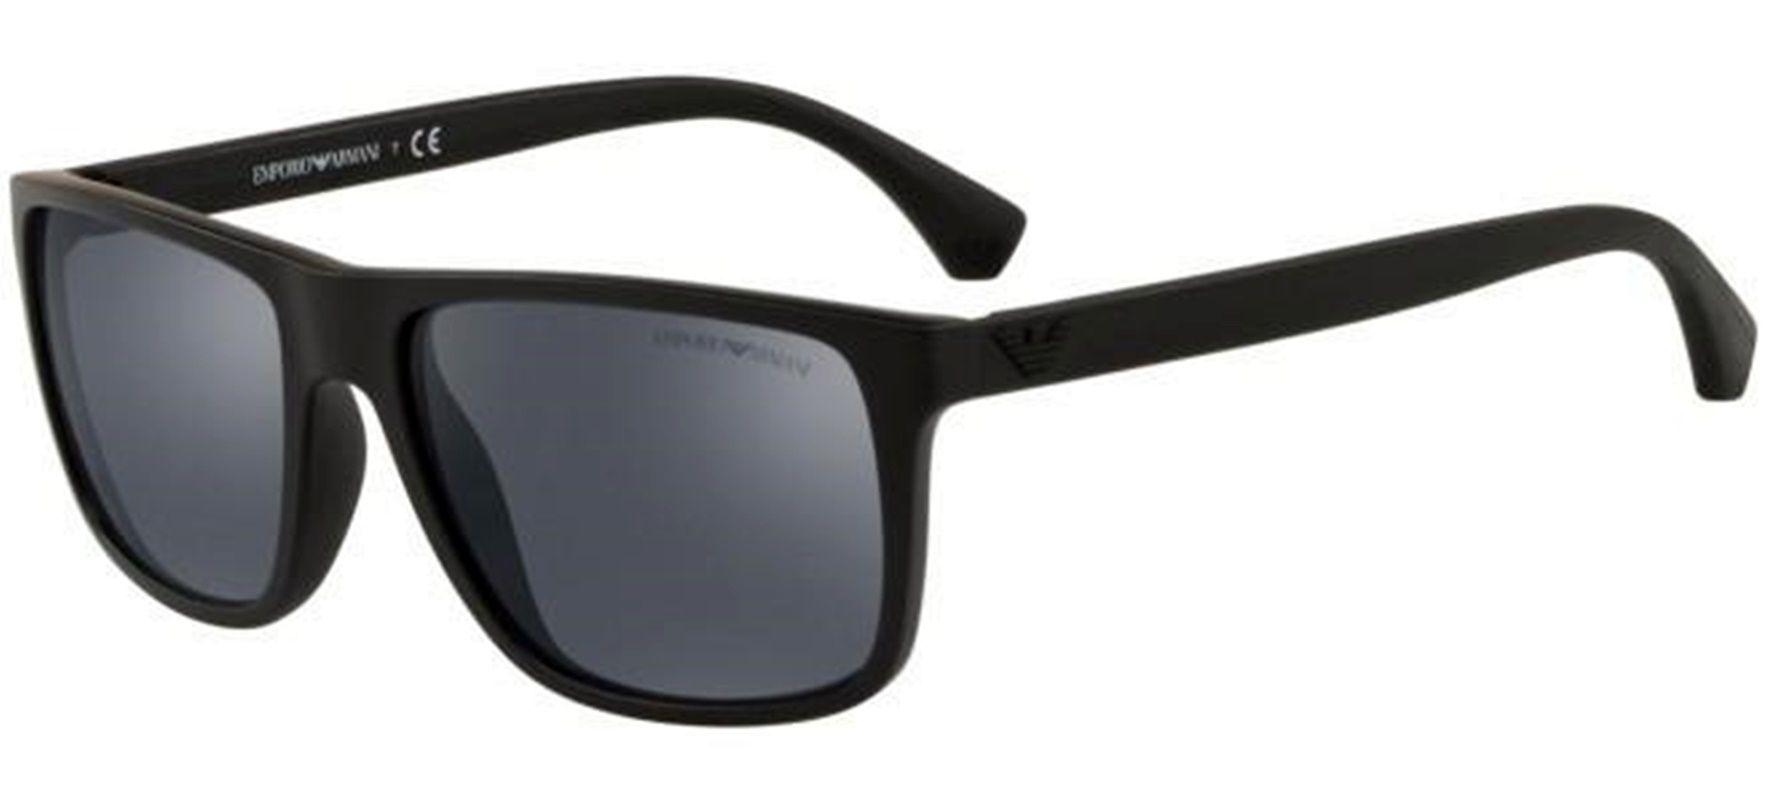 Óculos de Sol Emporio Armani EA4033 5649 6Q - Omega Ótica e Relojoaria e3bb6af753